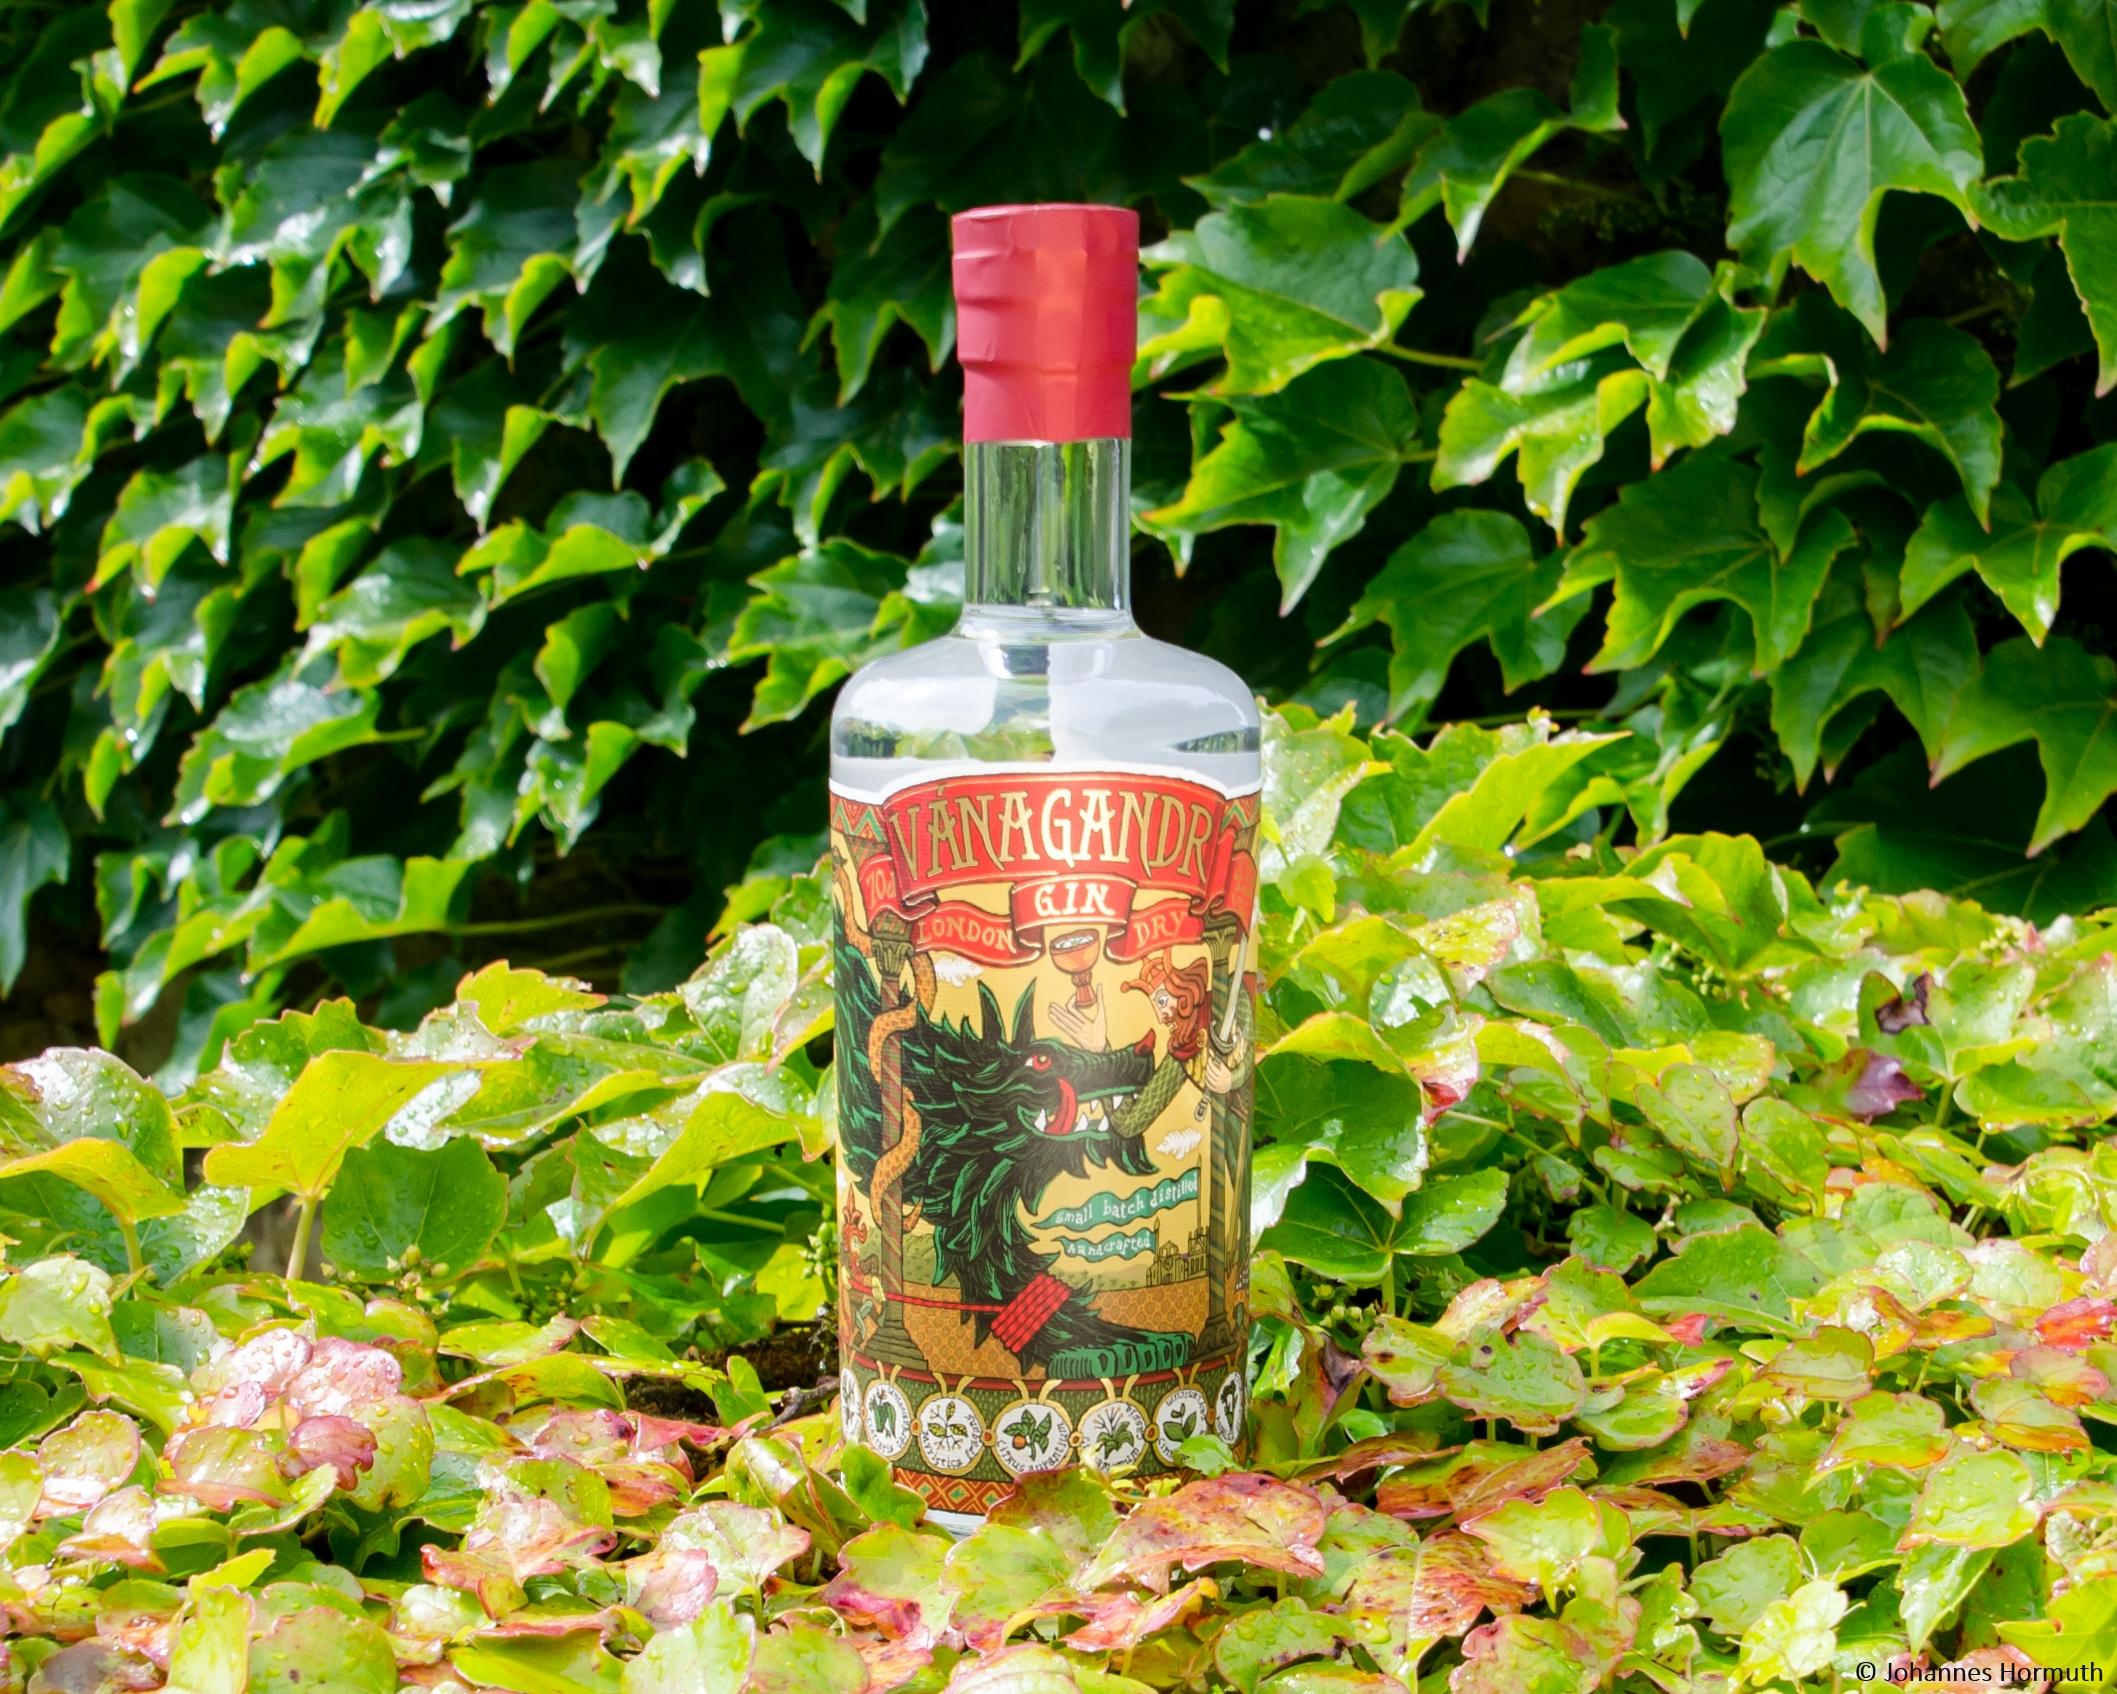 Vanagandr London Dry Gin